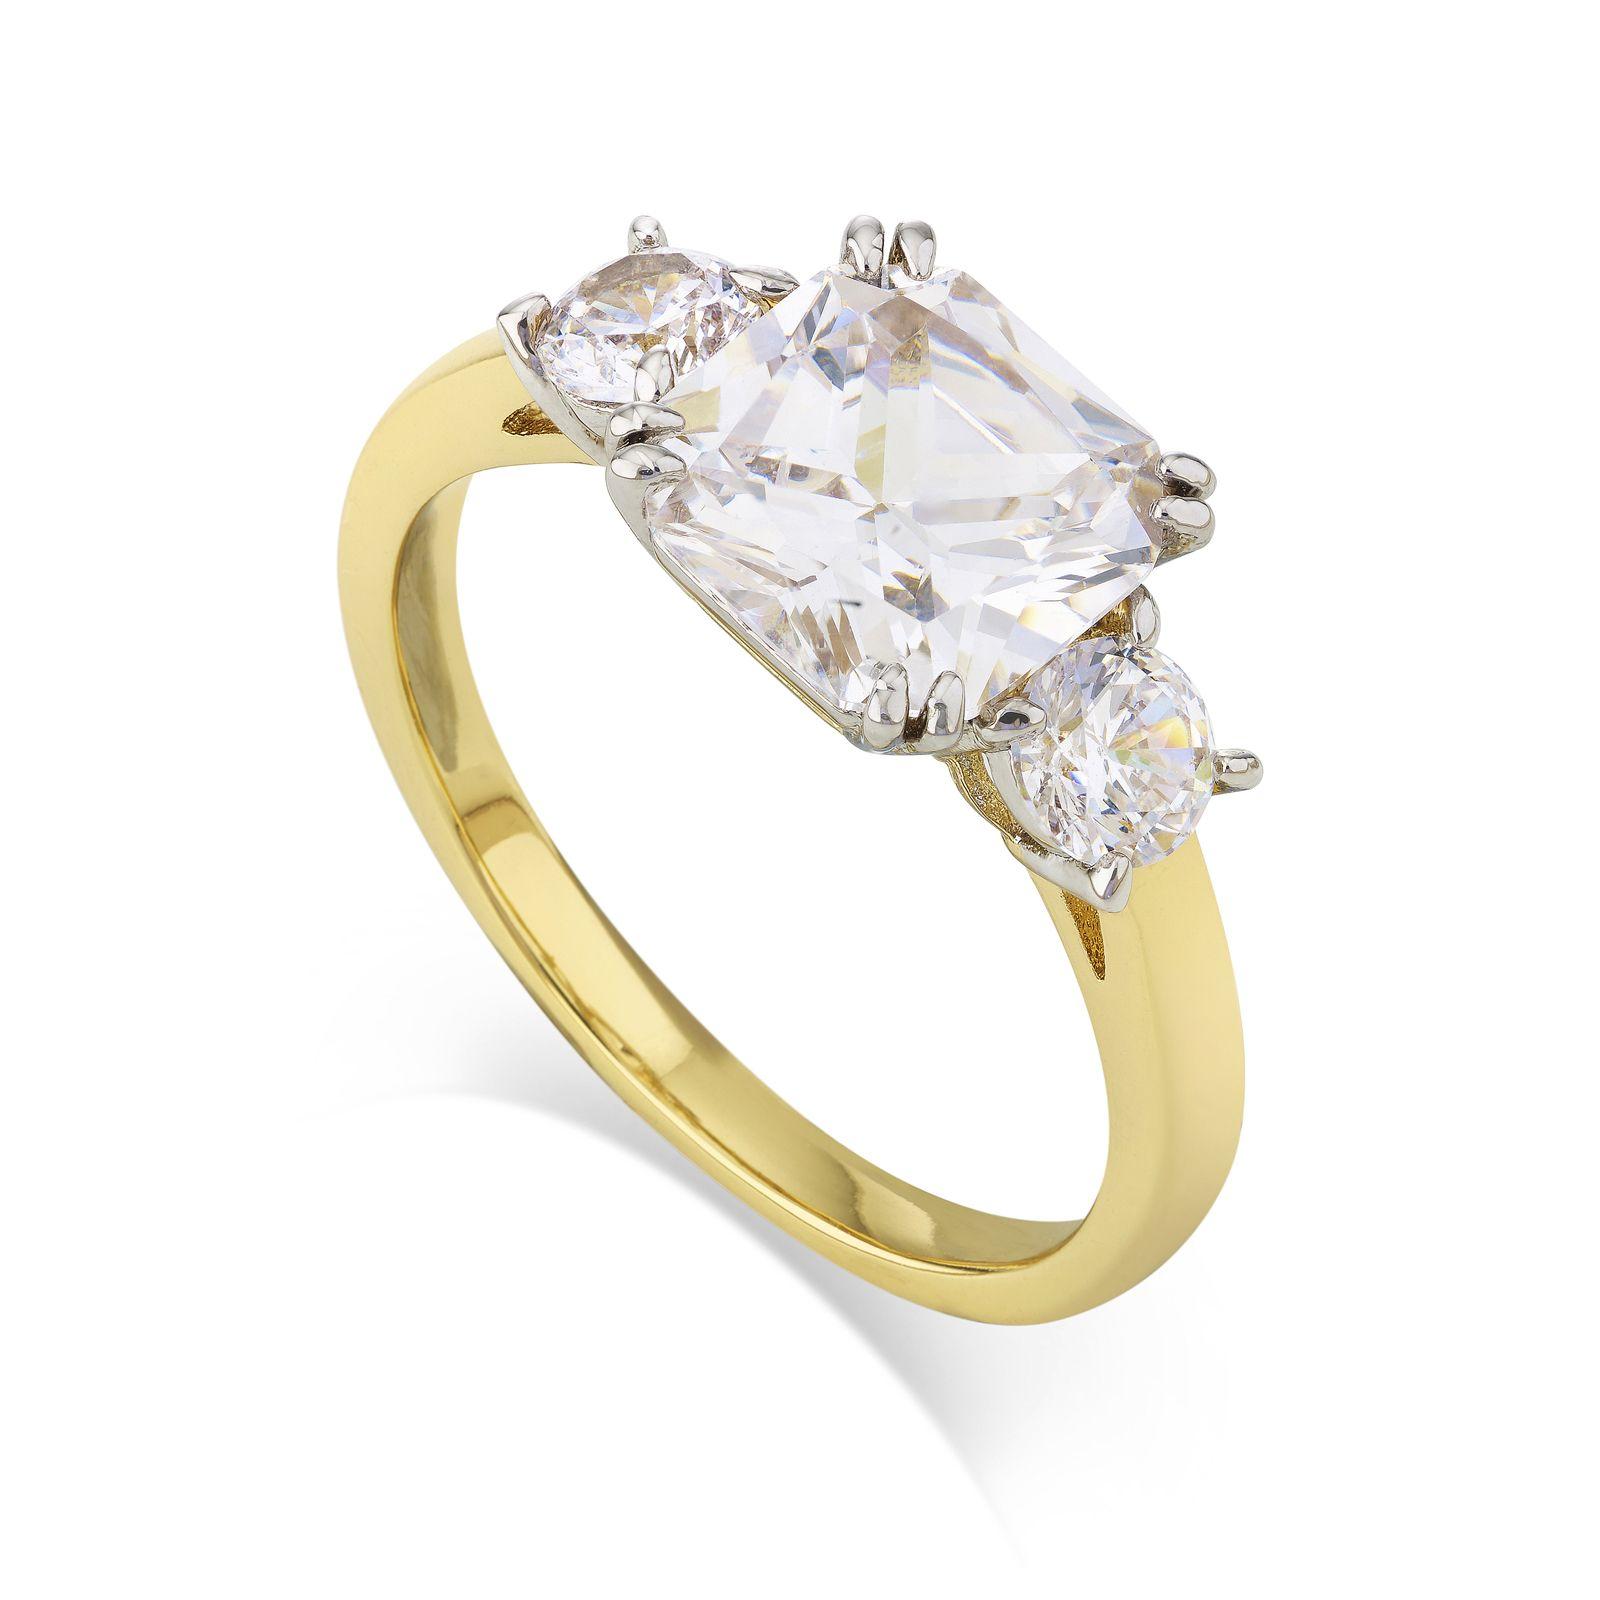 Buckley London Meghan Markle Ring - Small